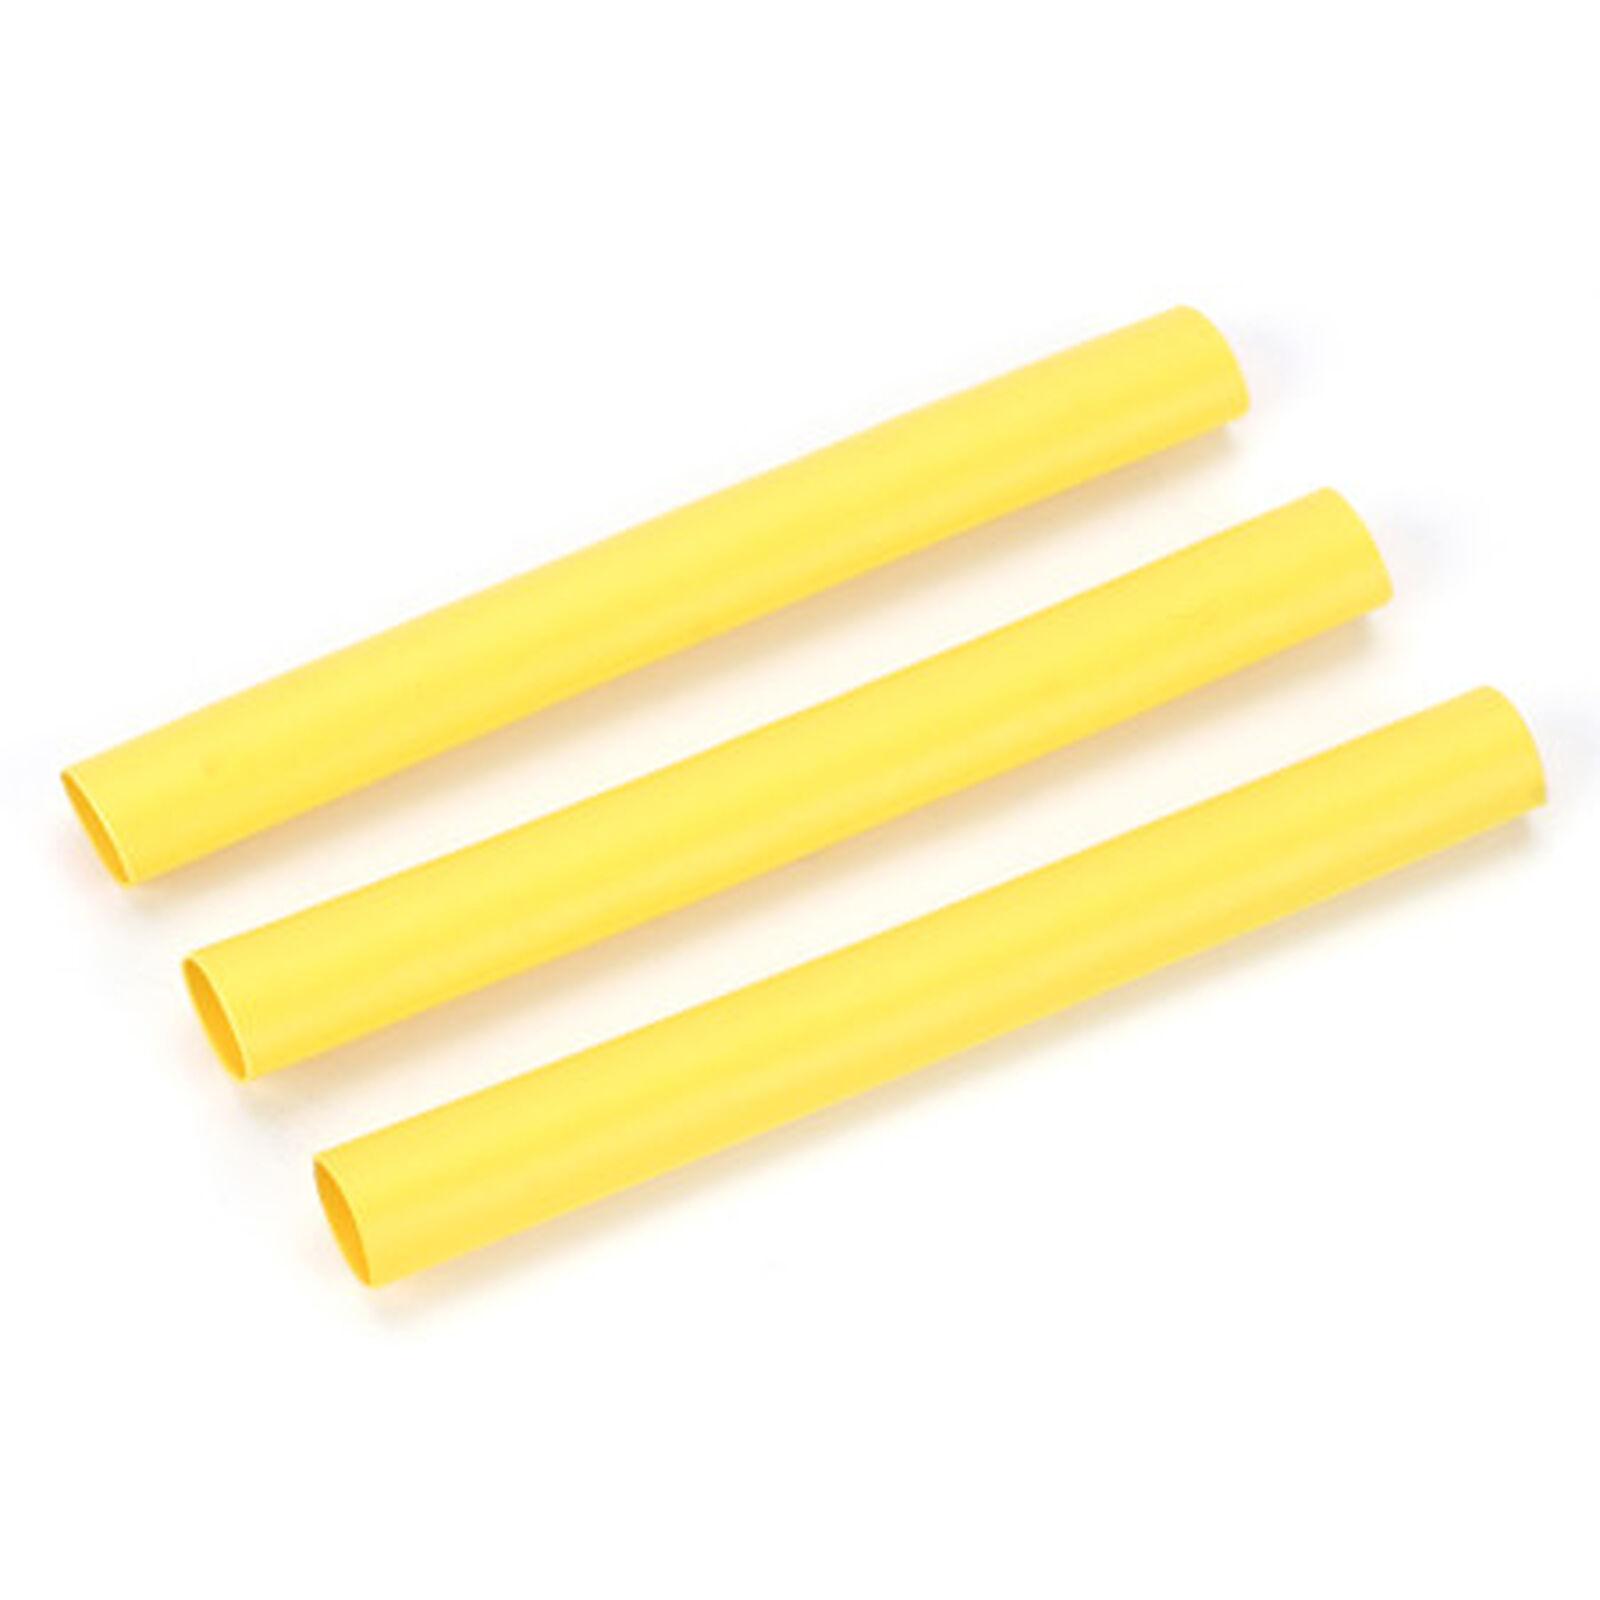 "Heat Shrinkwrap, 1/4"", Yellow"